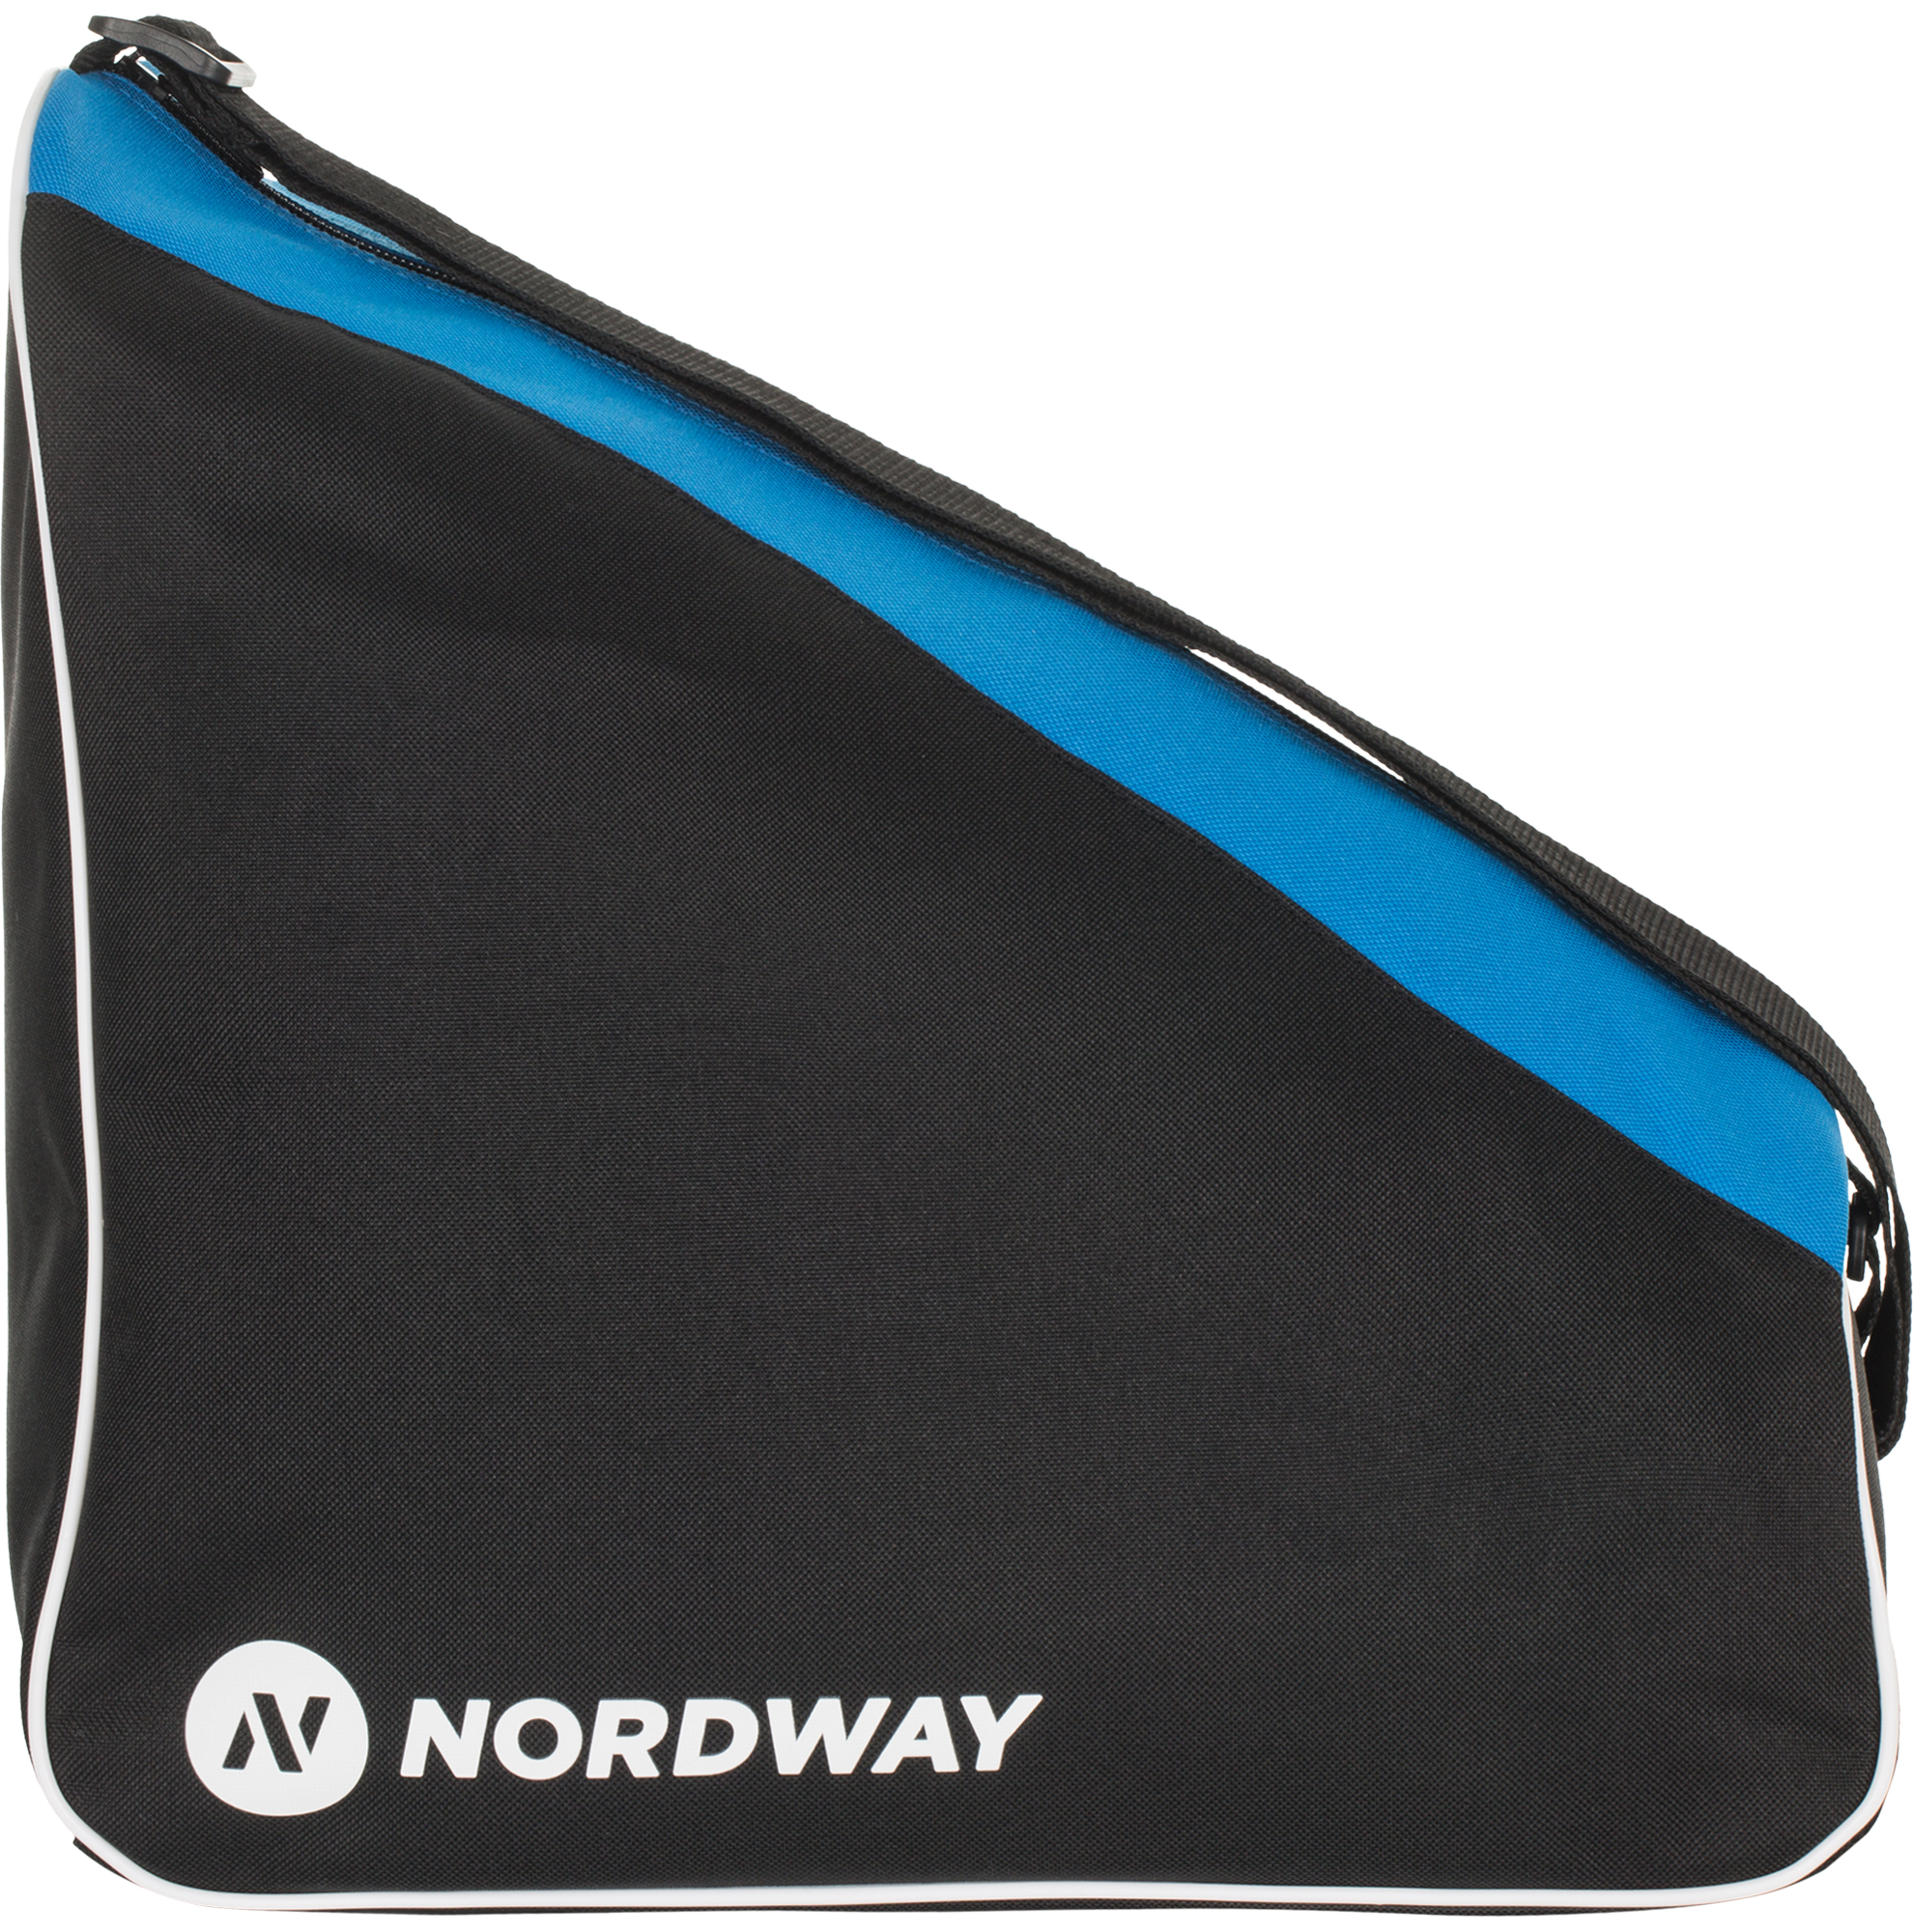 Nordway Сумка для ледовых коньков детская Nordway, размер Без размера цены онлайн